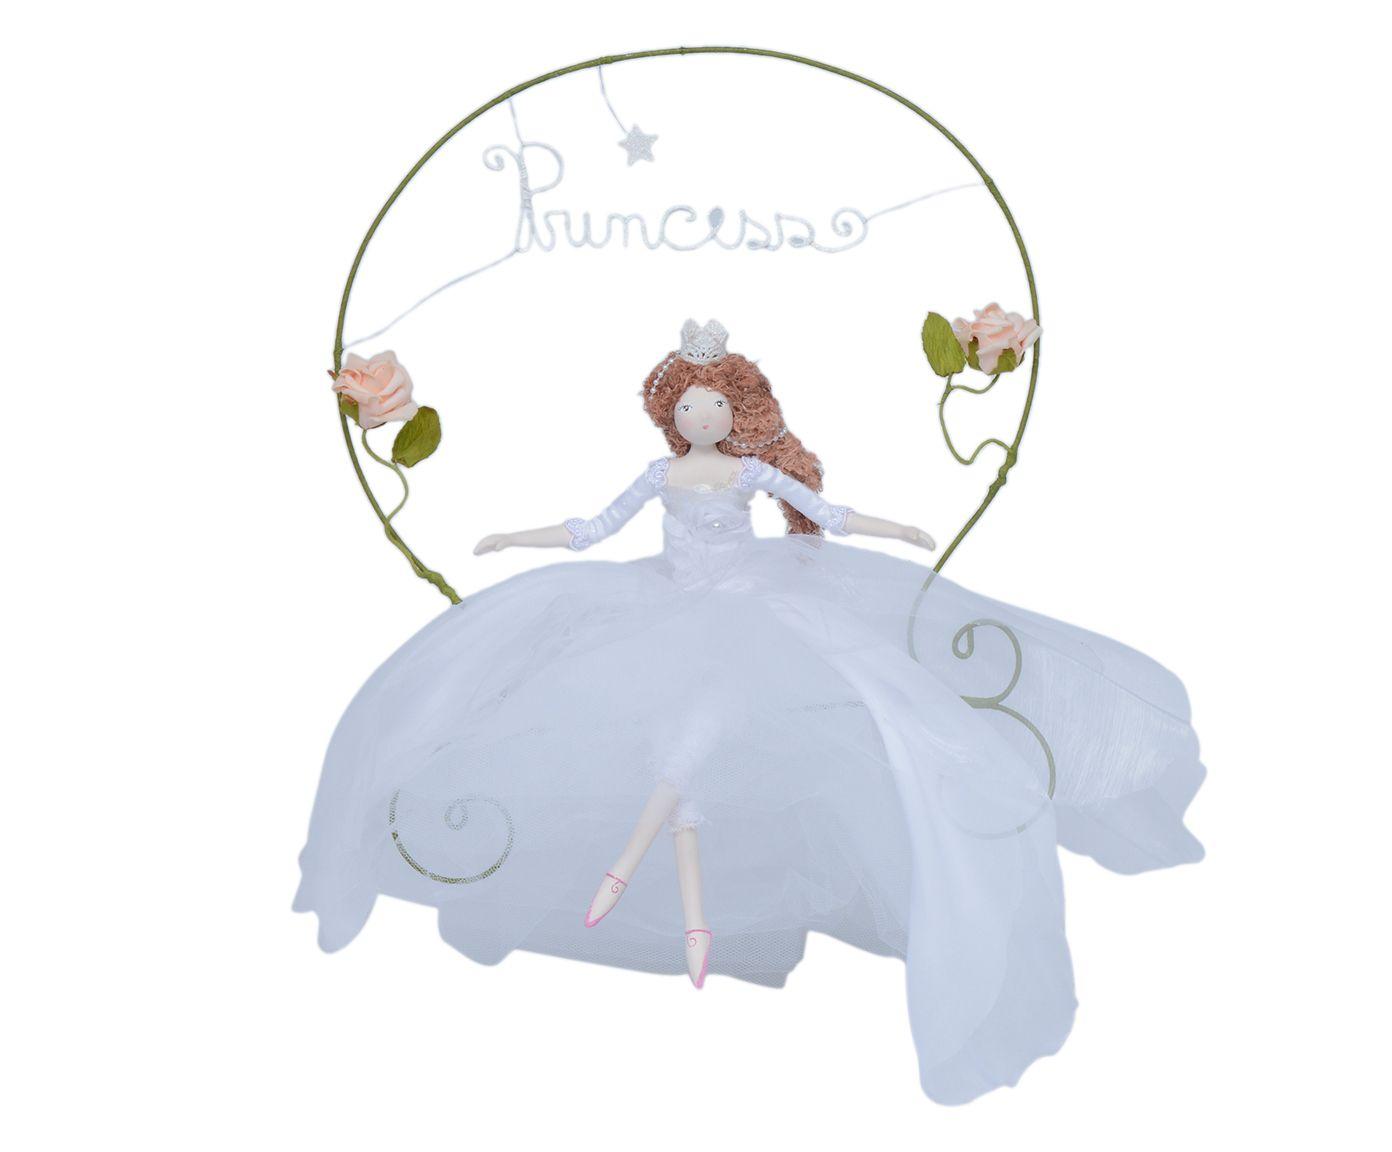 Escultura Princesa No Arco   Westwing.com.br